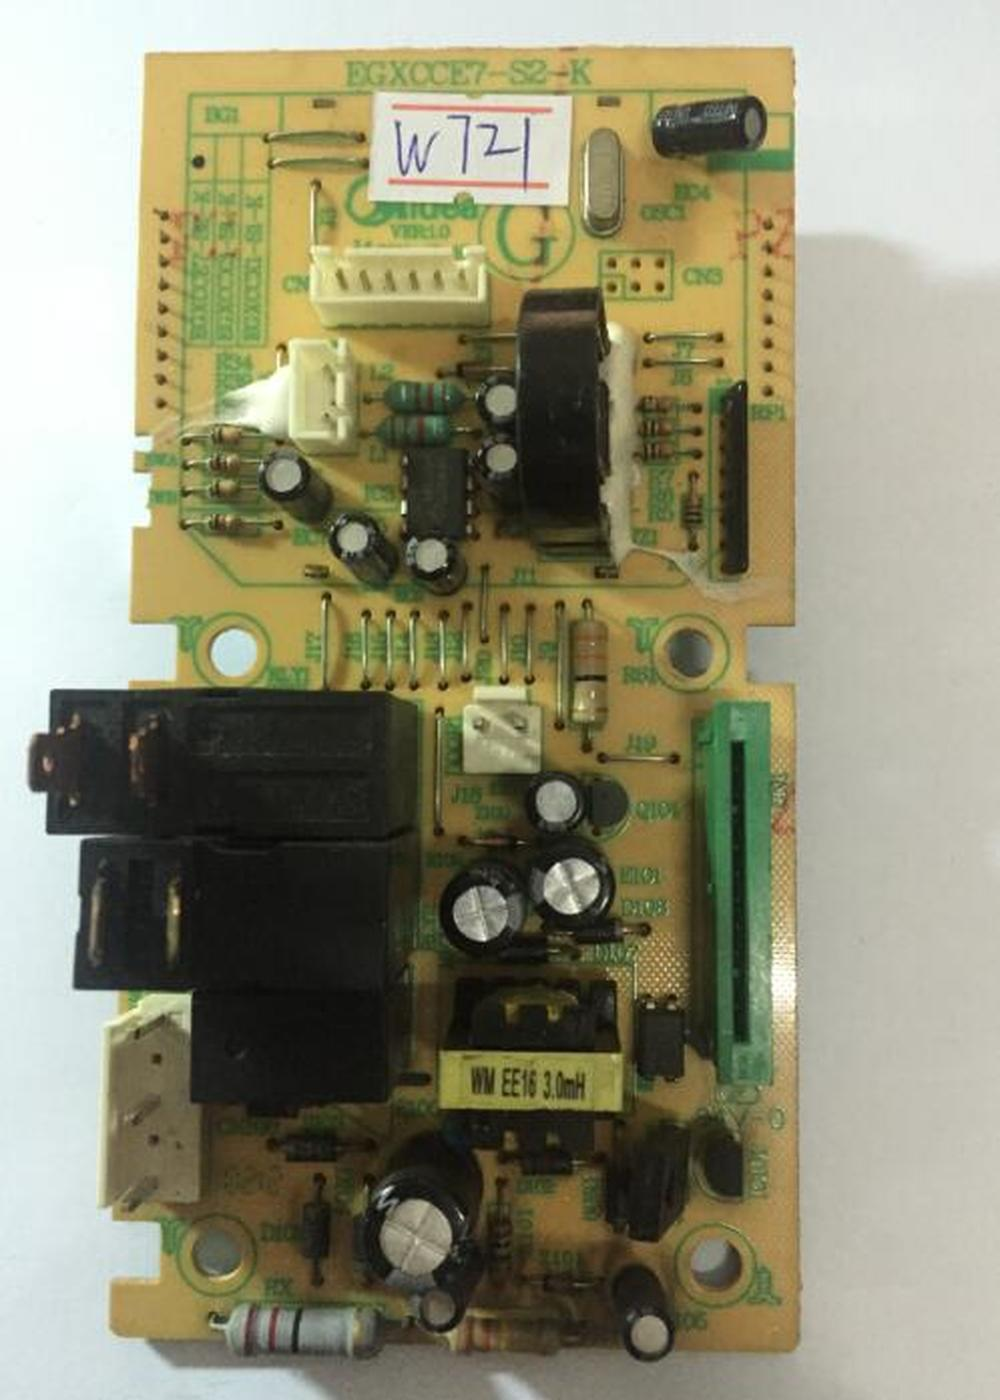 90% New original midea Microwave Oven computer board EGXCCE7-S2-K S1 EG823MF7-NRH3 EGXCCX1-S1-k mainboard